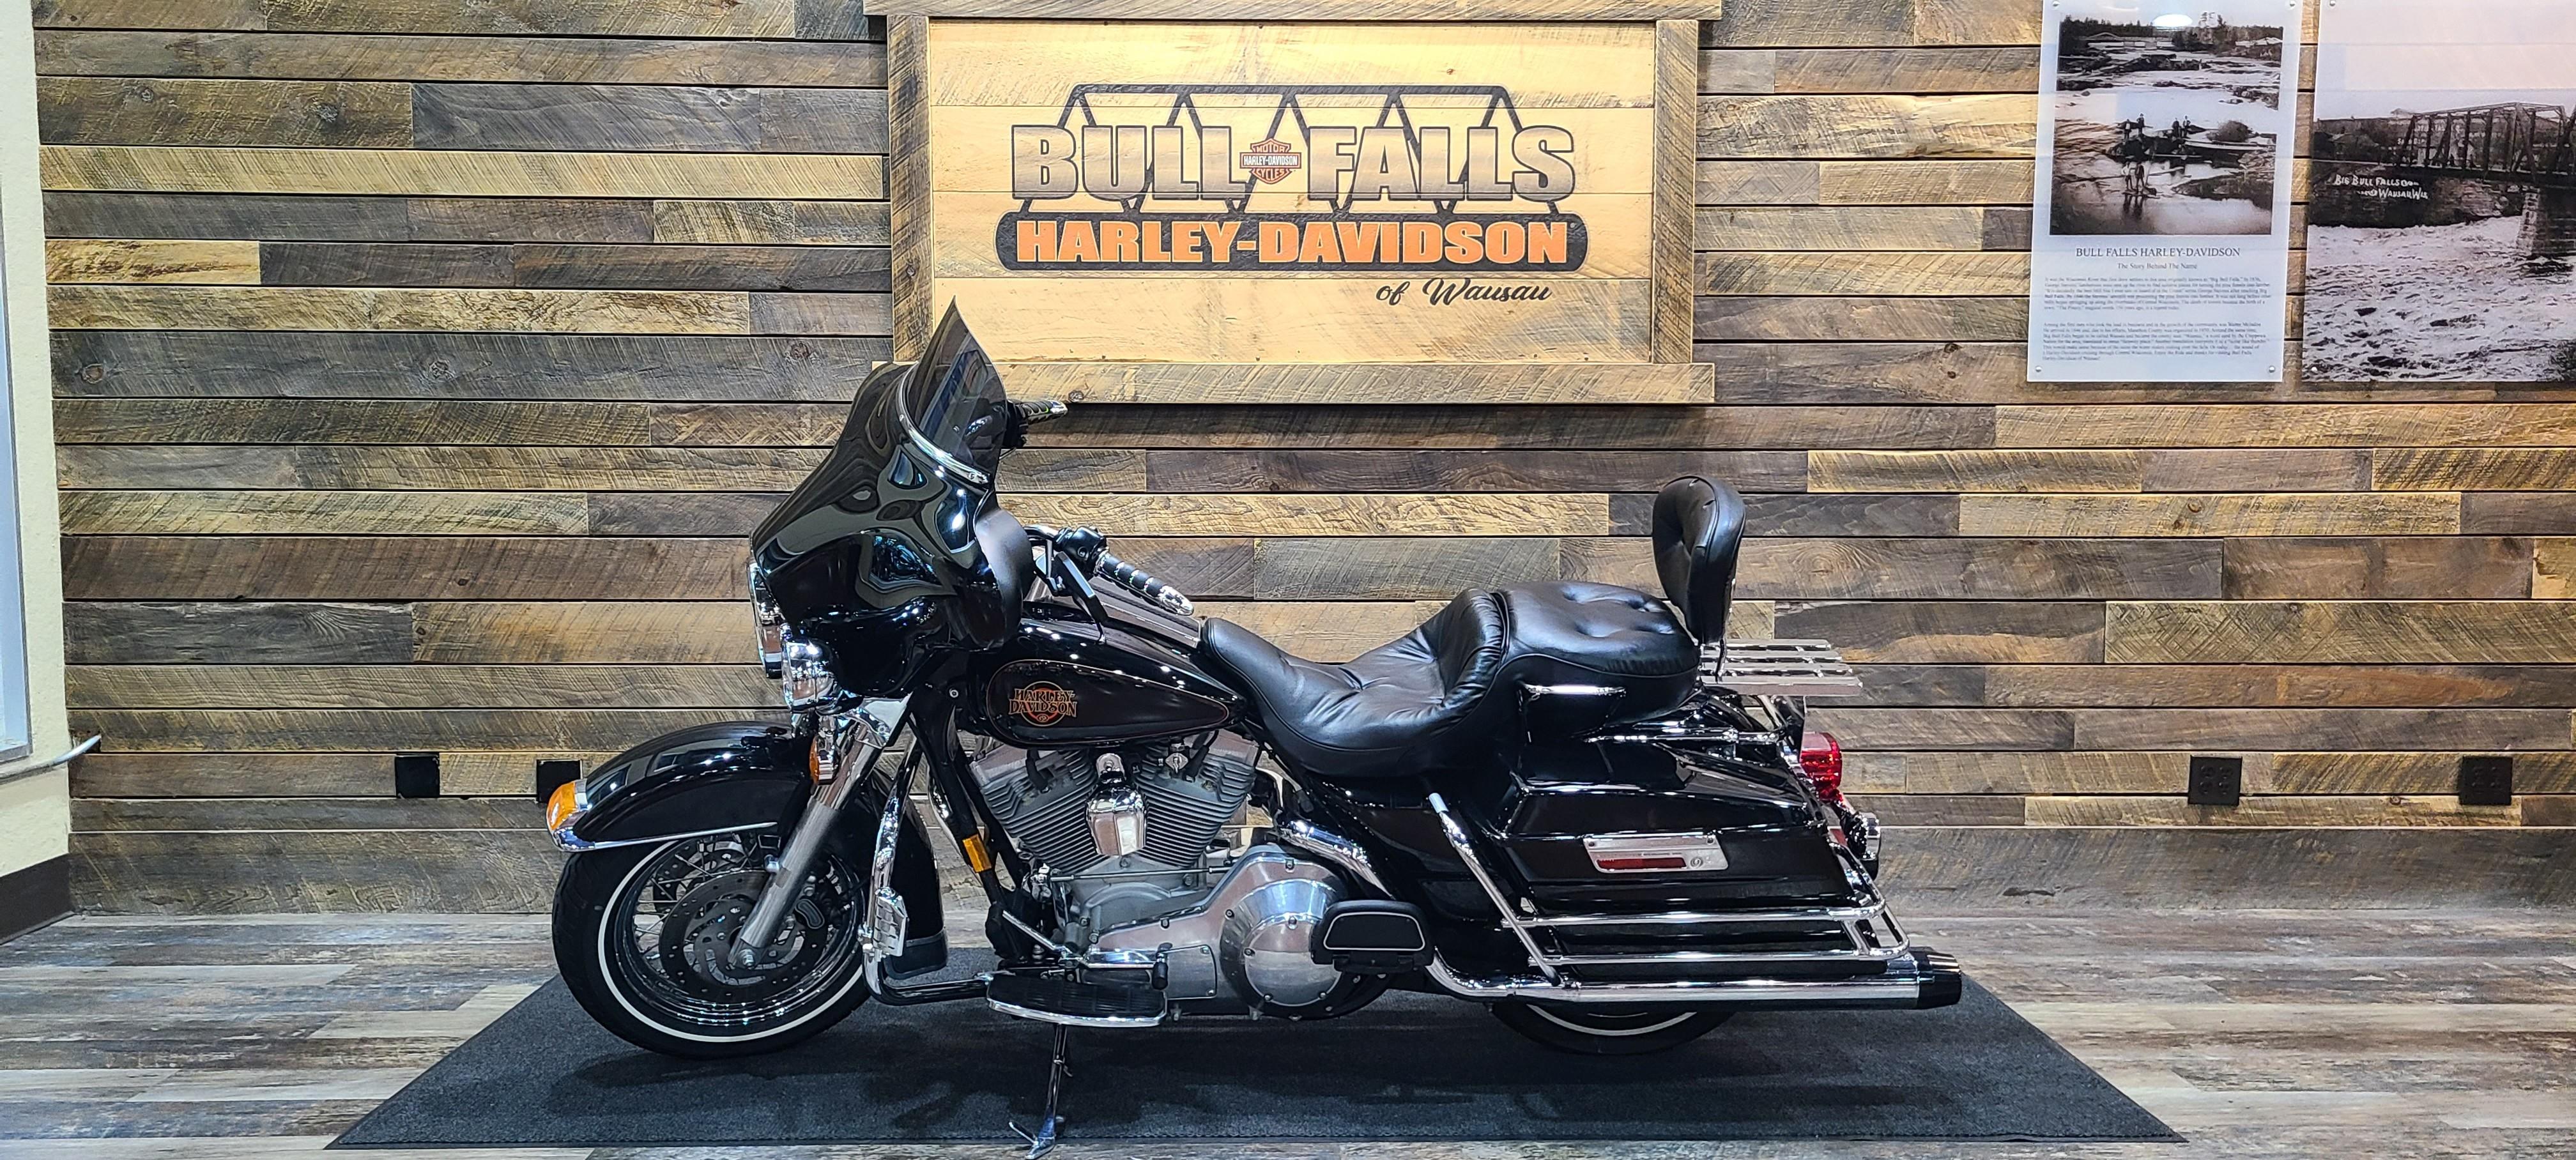 2002 Harley-Davidson FLHT at Bull Falls Harley-Davidson